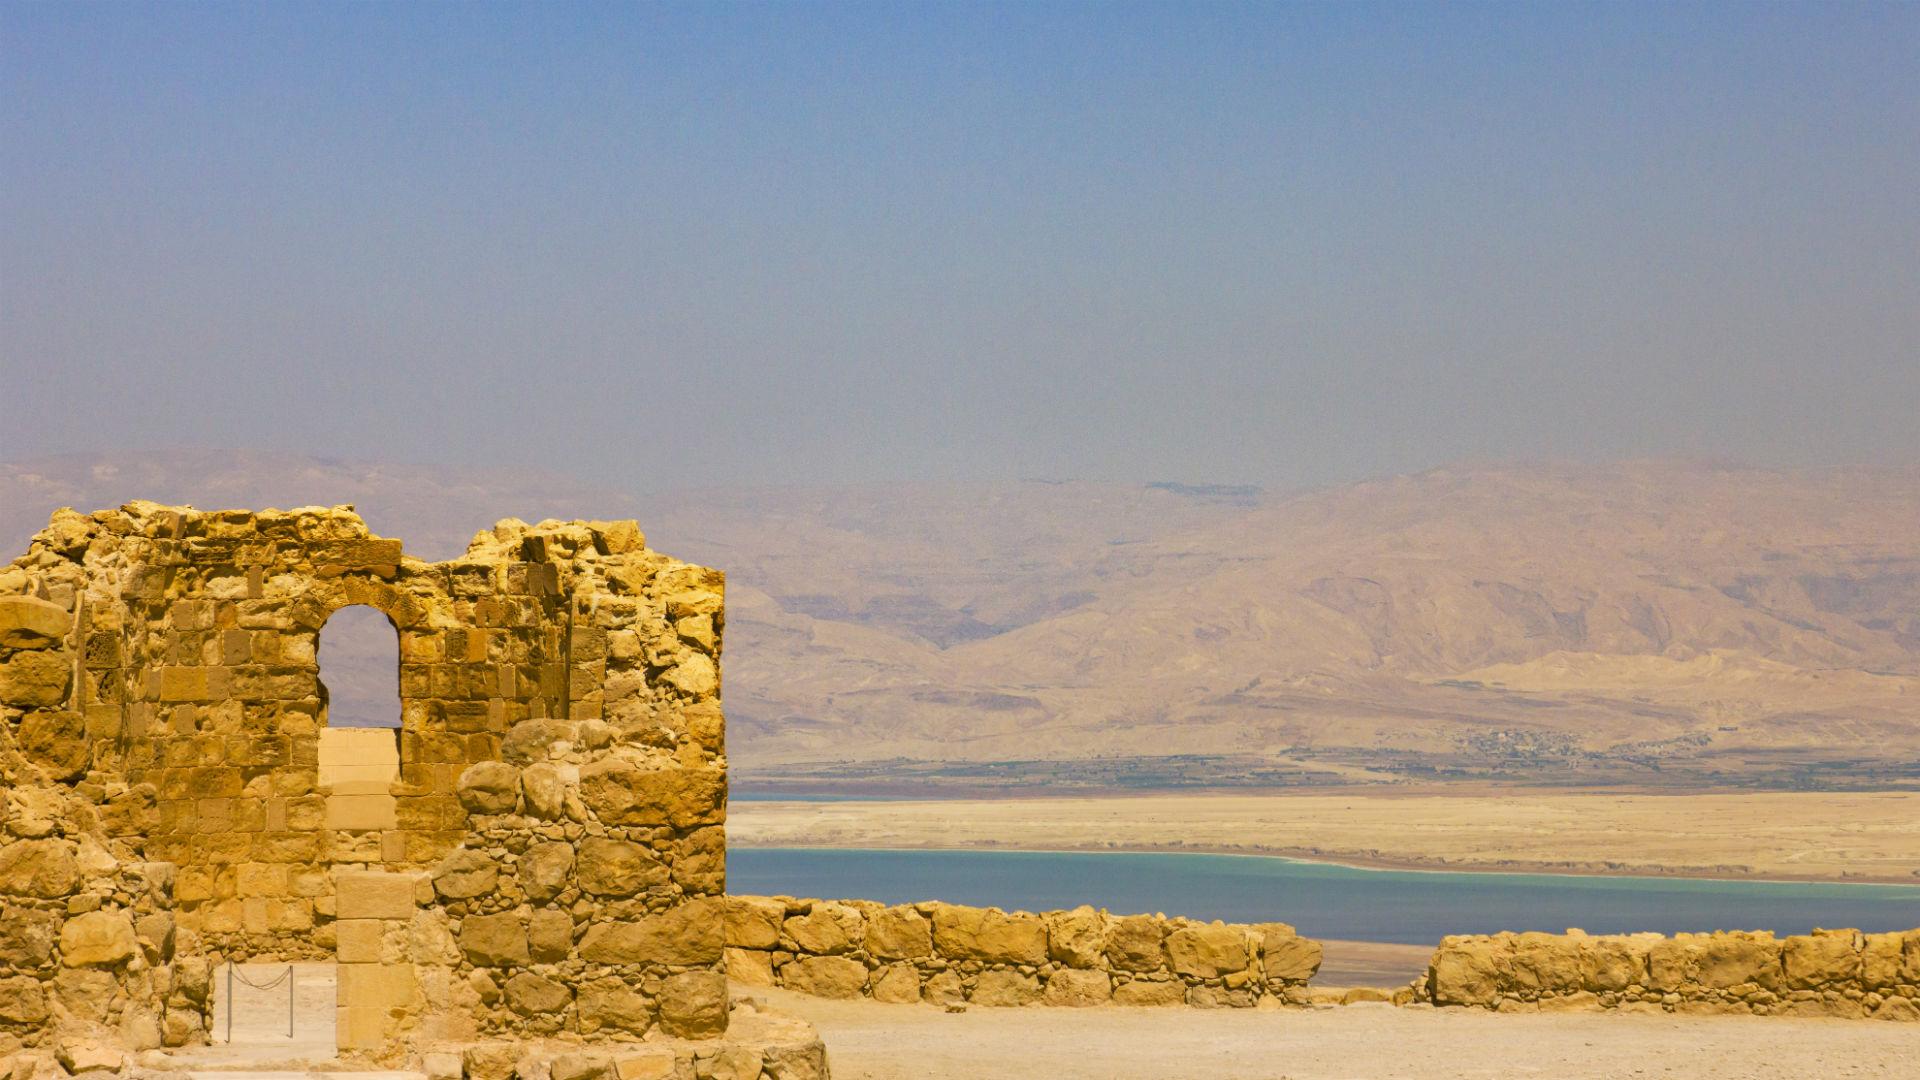 UNESCO World Heritage site, Masada ruins, overlooking the Dead Sea, Israel.